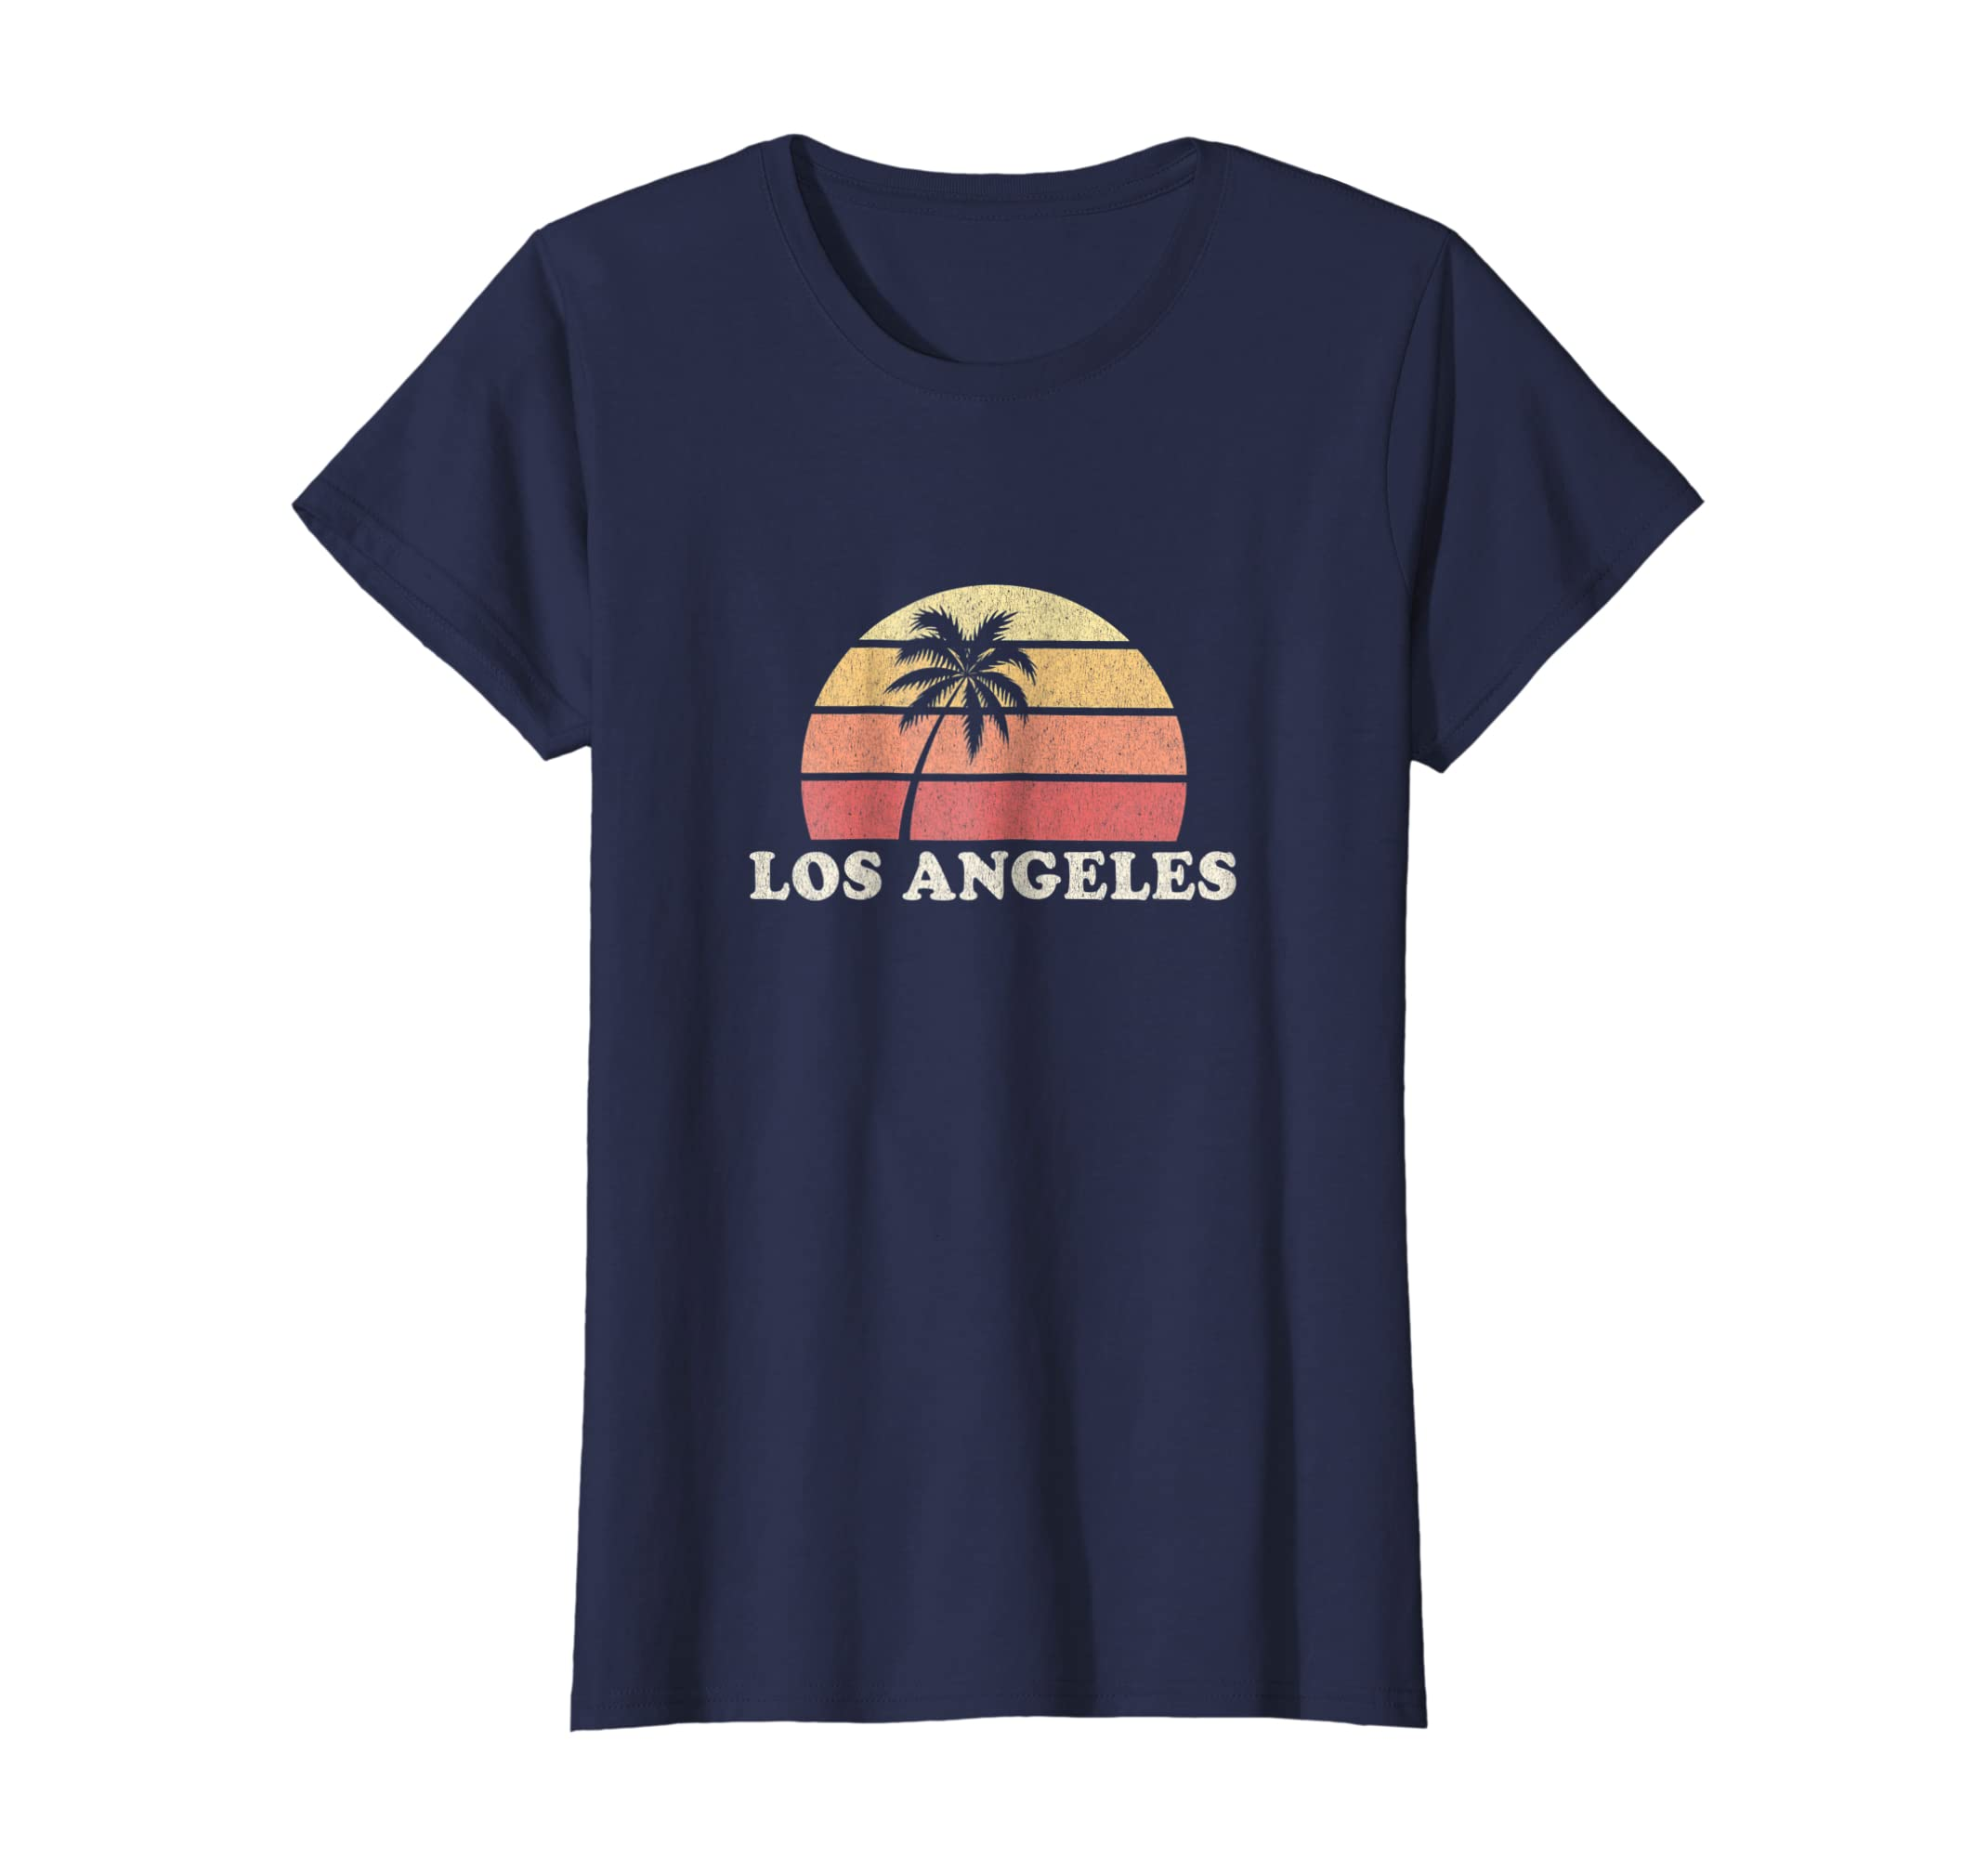 f33de6809 Amazon.com: Los Angeles LA CA Vintage T Shirt Retro 70s Throwback Tee:  Clothing